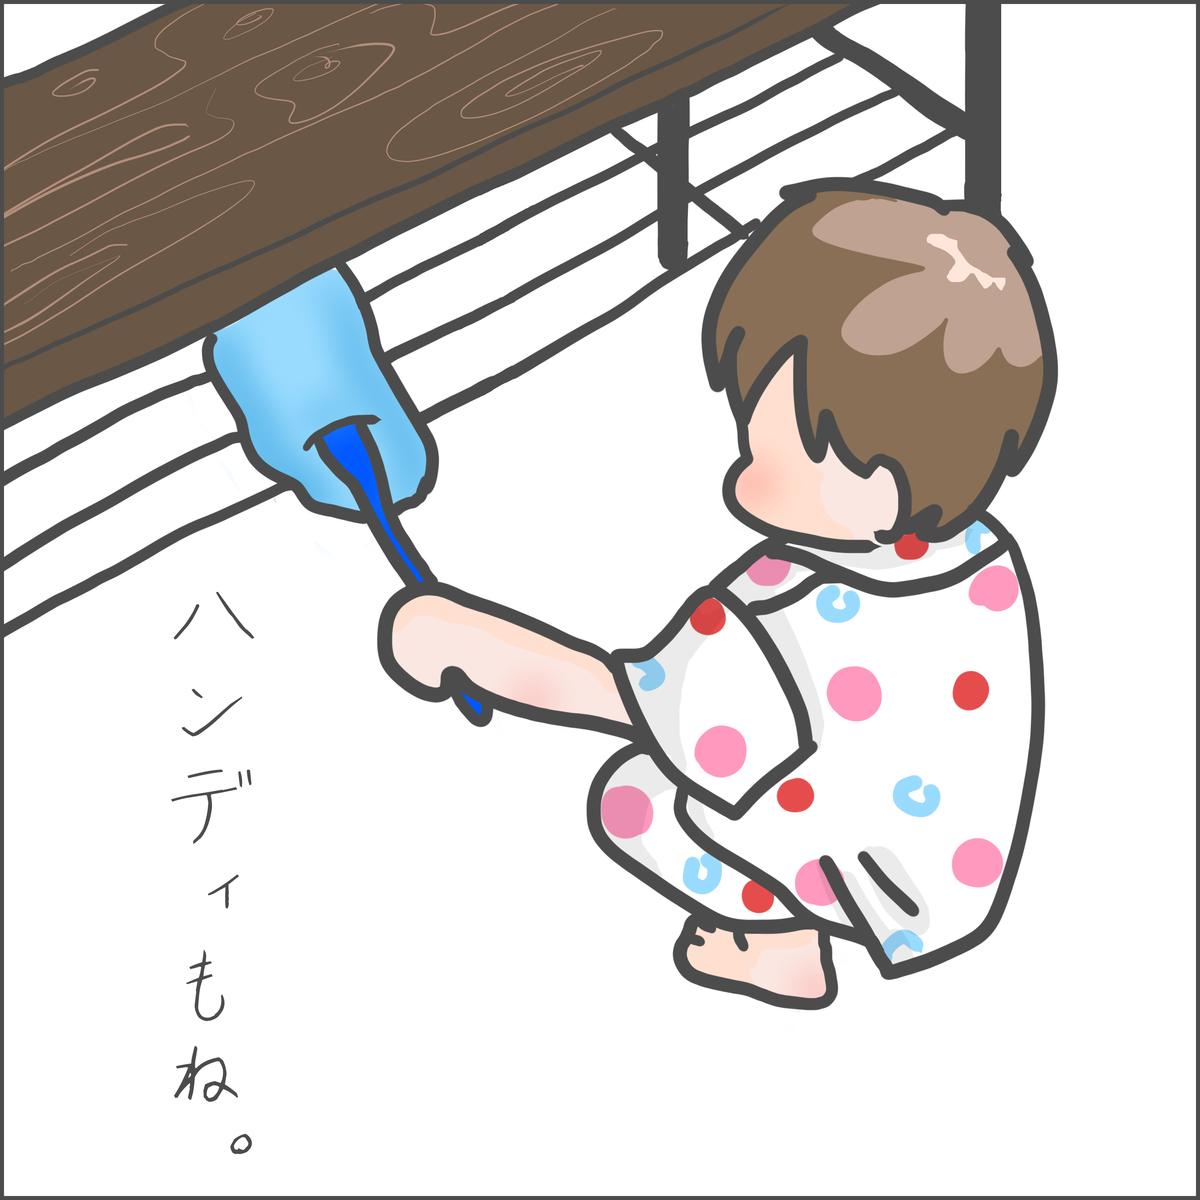 f:id:ika_yoshi:20201102234433j:plain